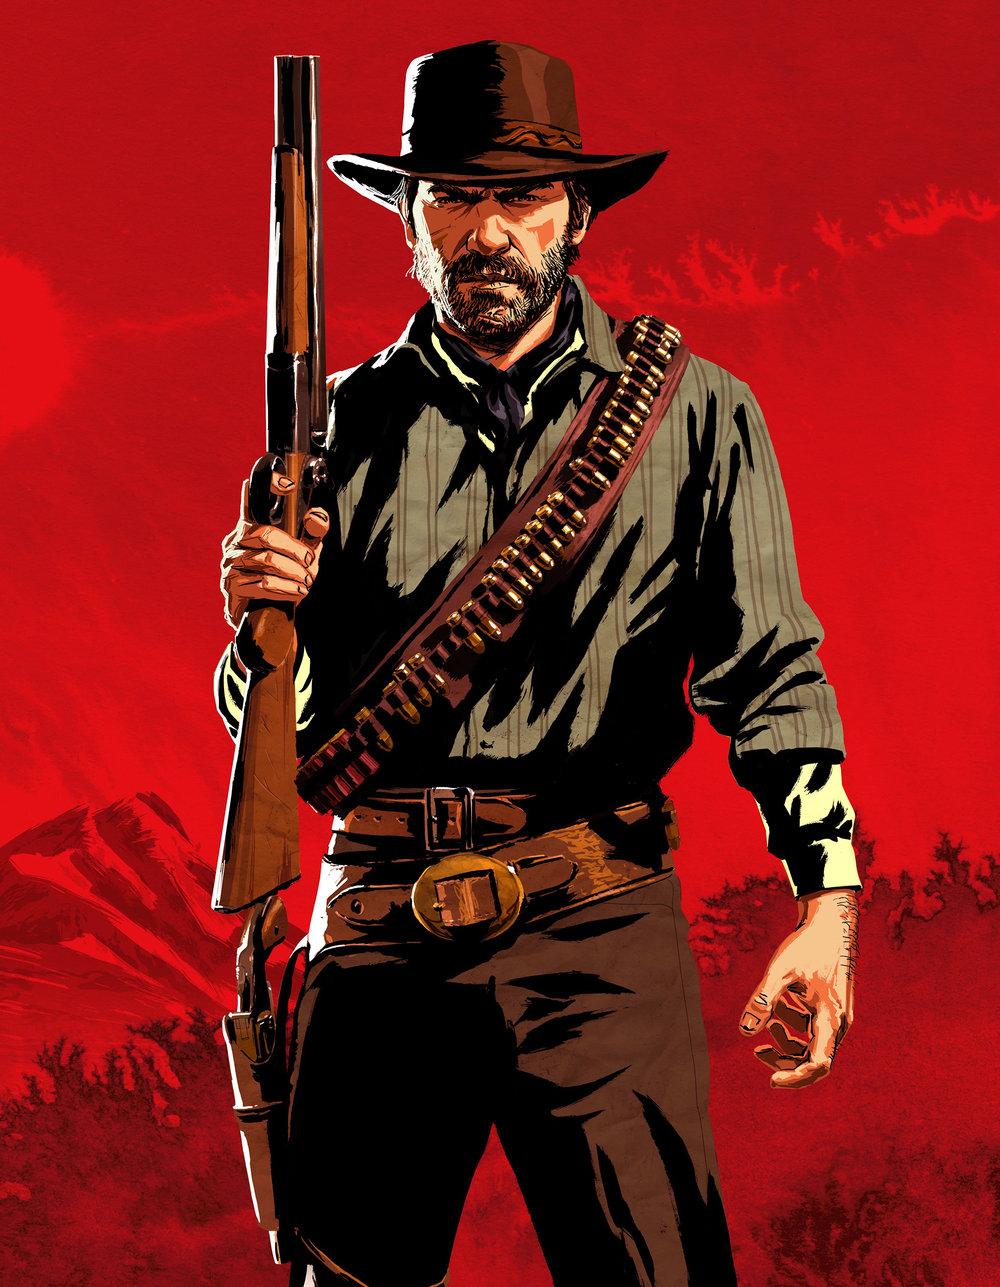 Arthur+Standing+With+Shotgun_2000px.jpg?